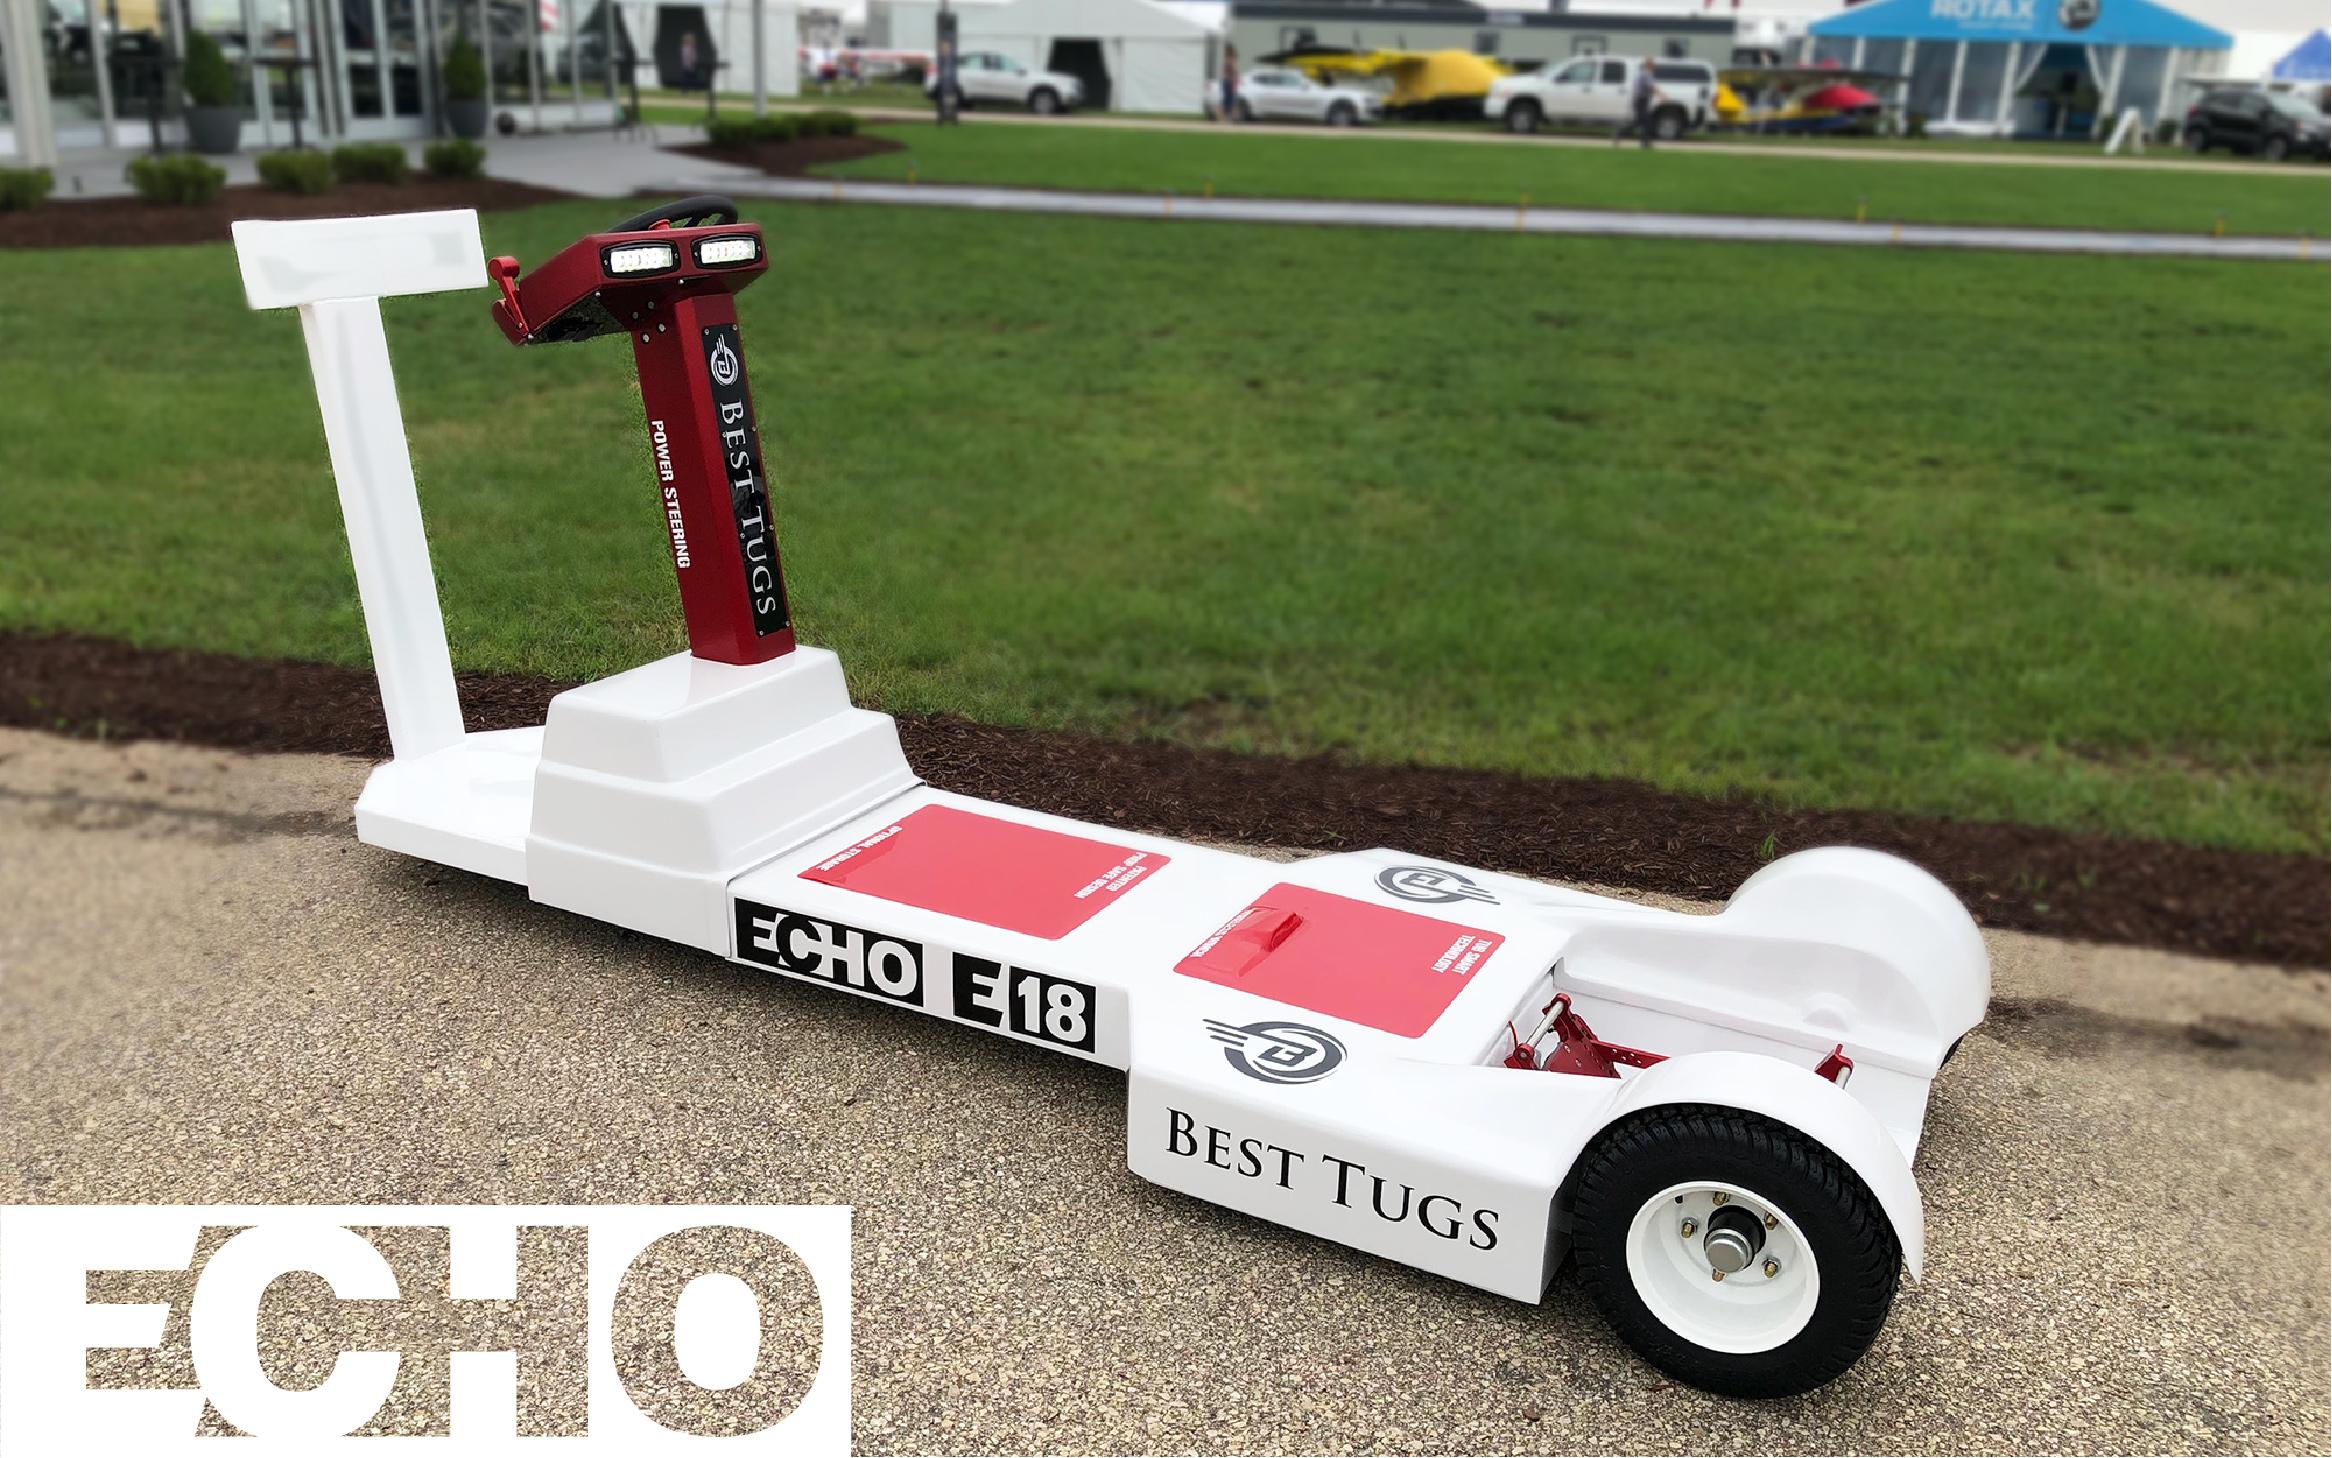 best tugs echo aircraft tug